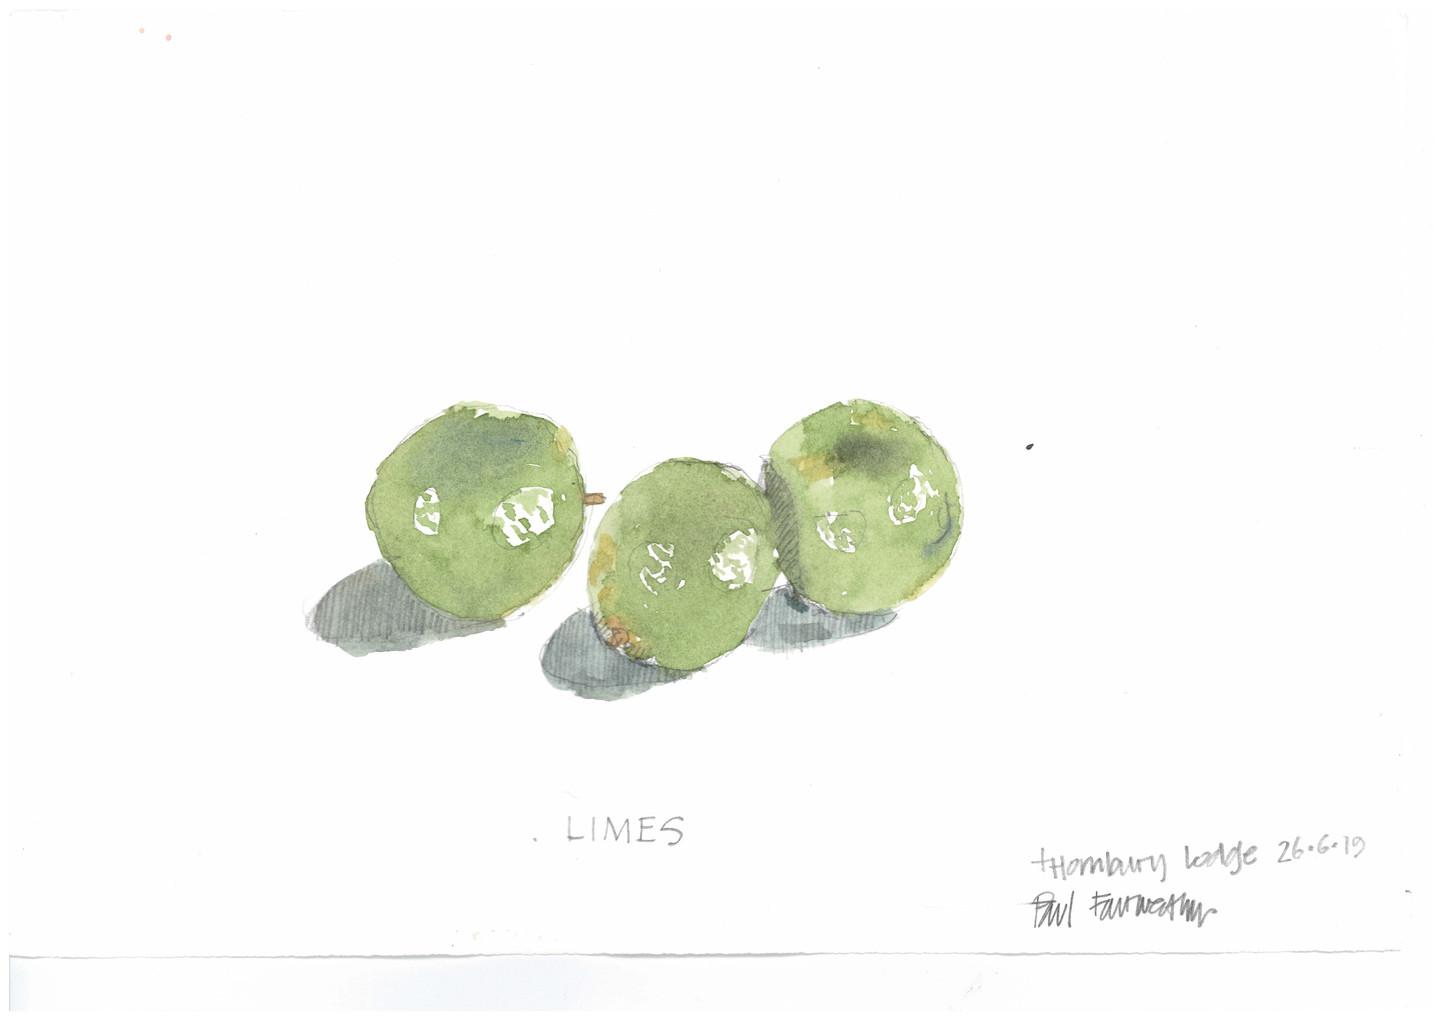 Limes - 26 June 2019